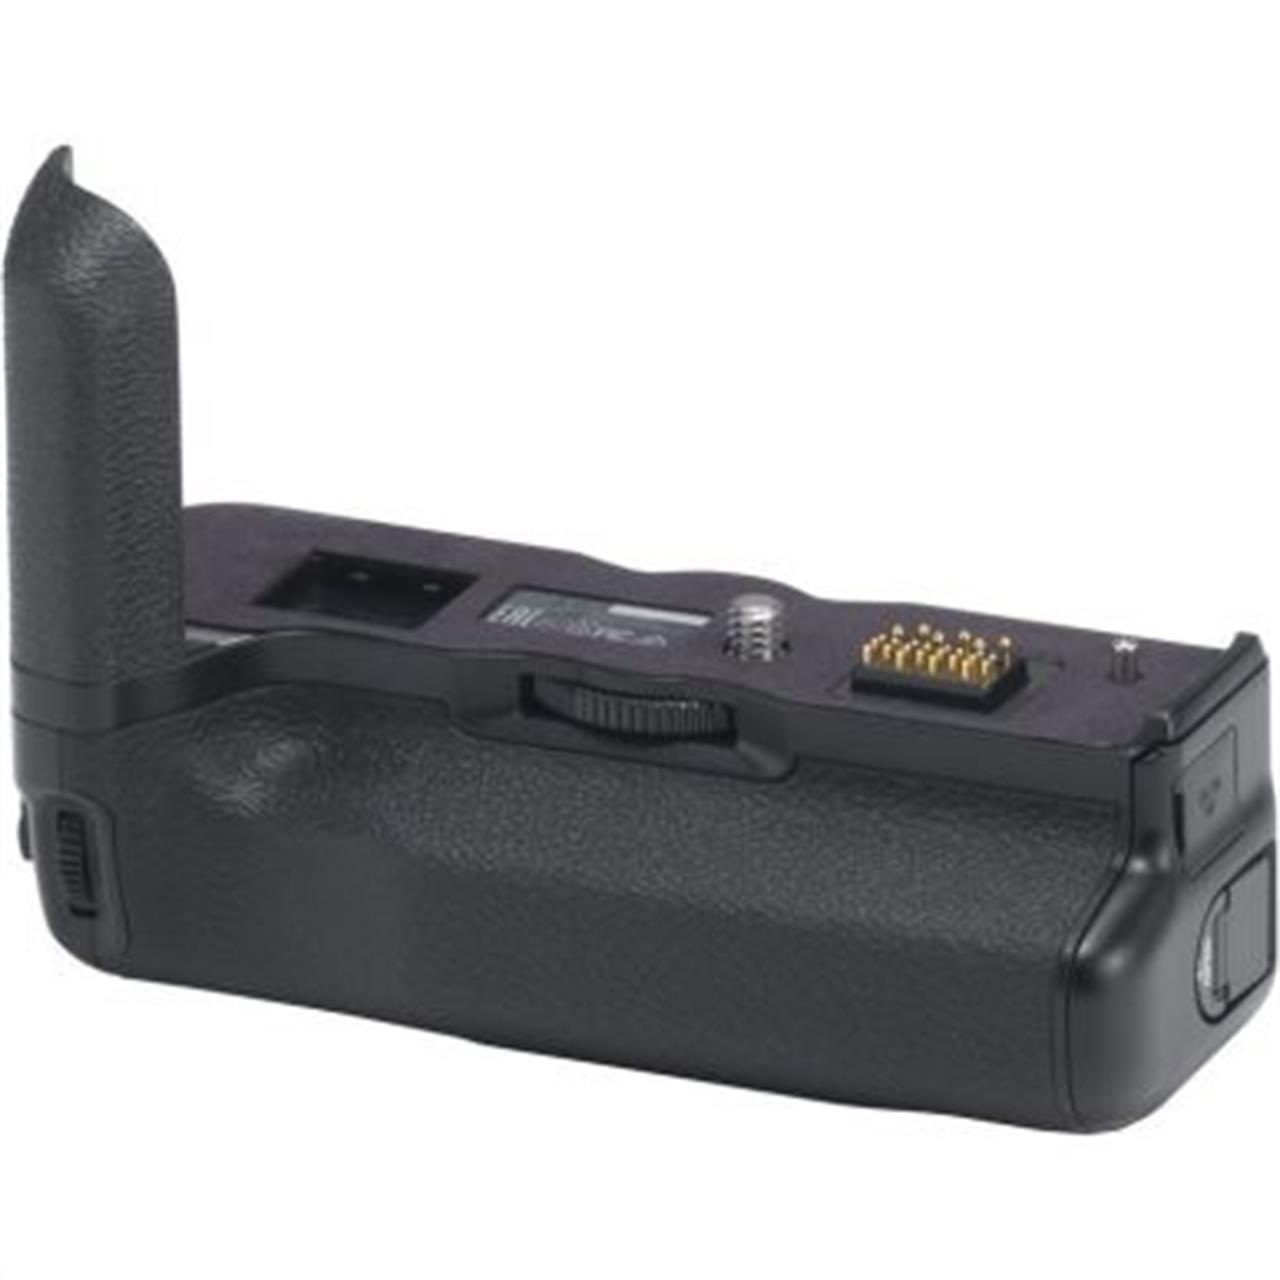 4547410378085__fujifilm-vg-xt3-battery-grip.jpg